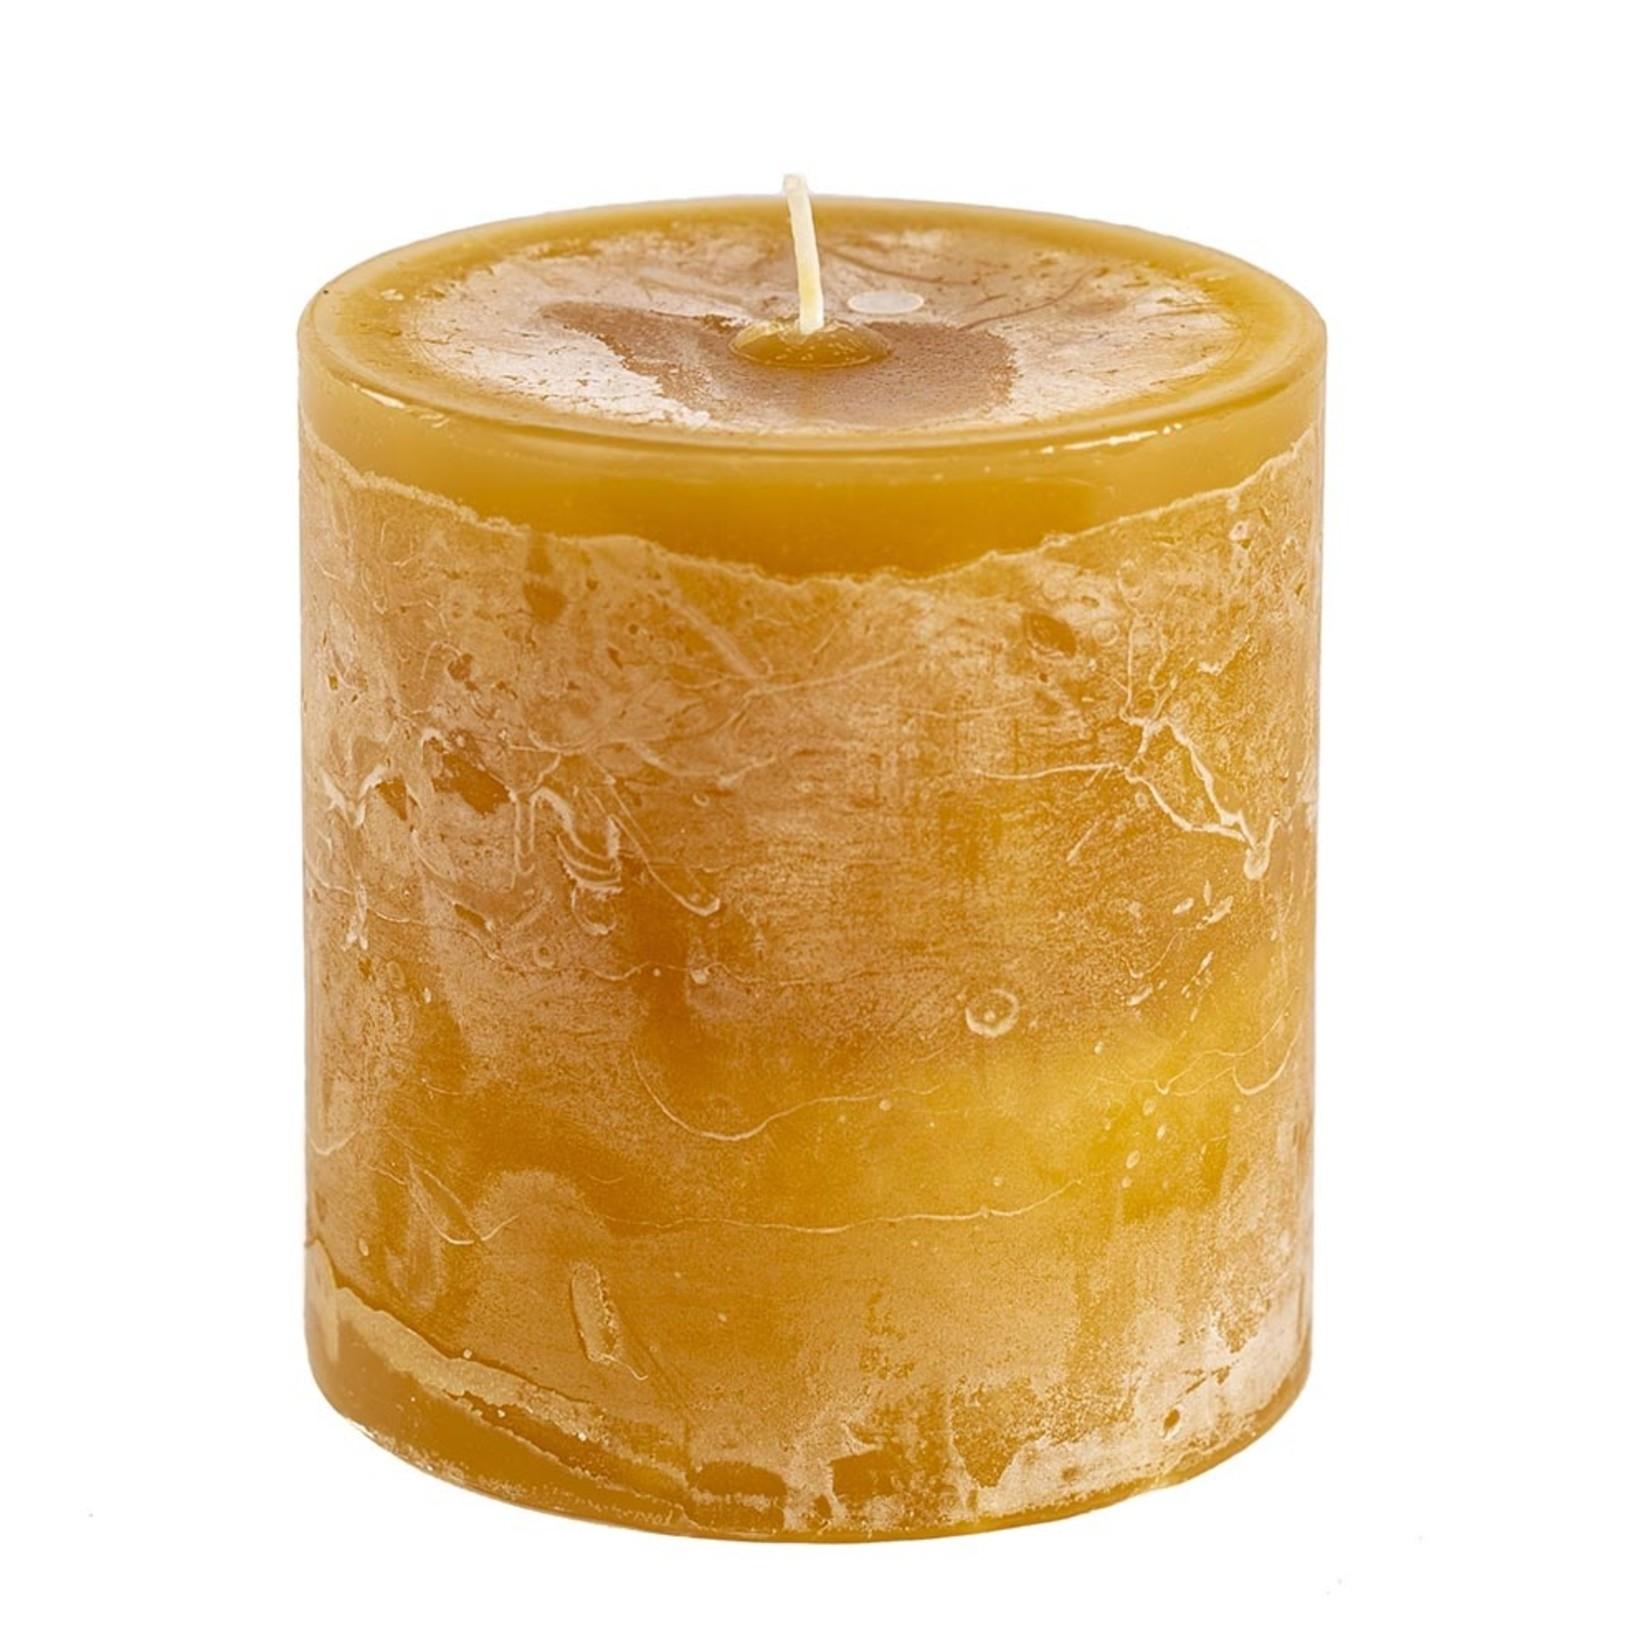 Home Society PIllar Candle 9x10cm Yellow